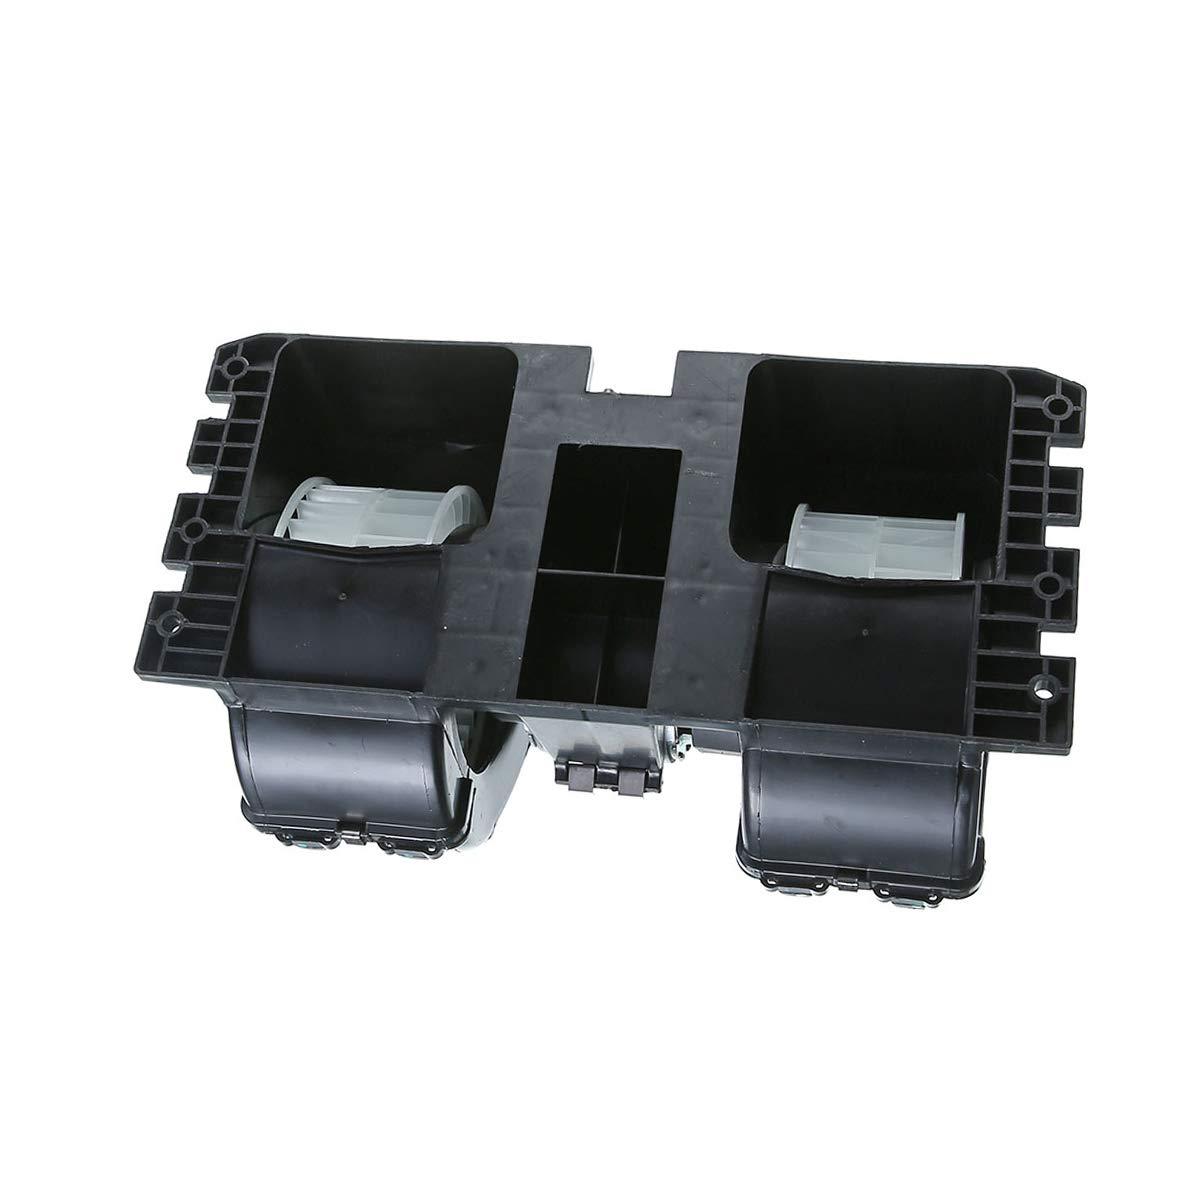 Ventilateur int/érieur pour ventilateur de chauffage 24 V TGA TGL TGM TGS TGX 2000-2016 81619306089